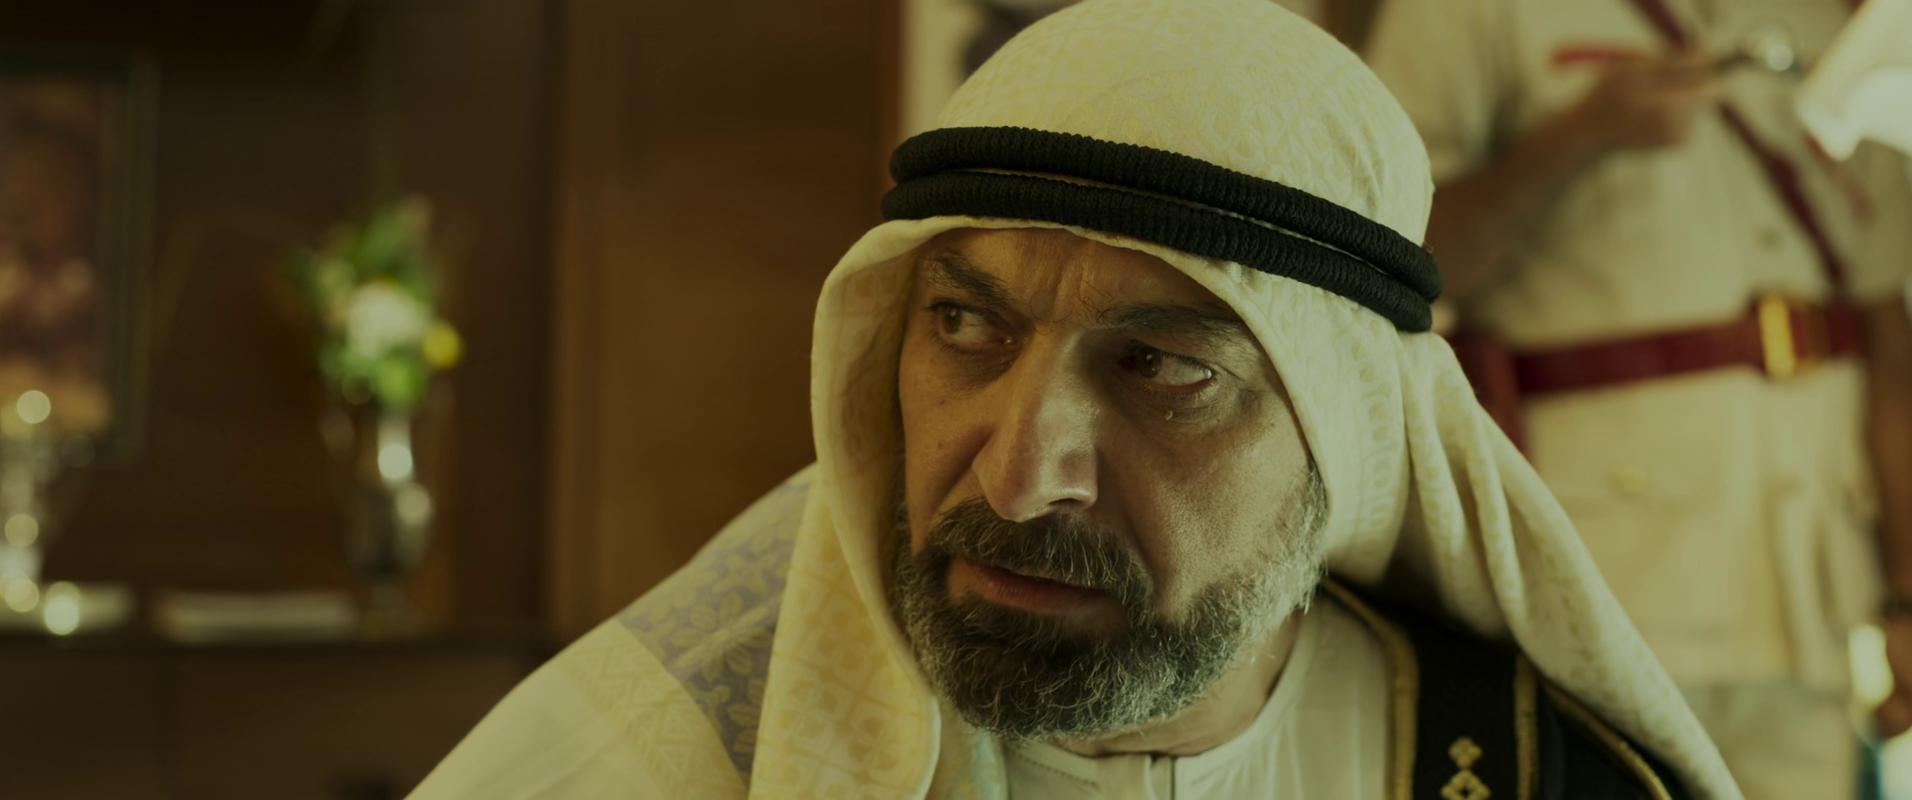 Bell Bottom 2021 Full Hindi Movie Download HDRip 1080p Watch Free Movie Online Stream Hd